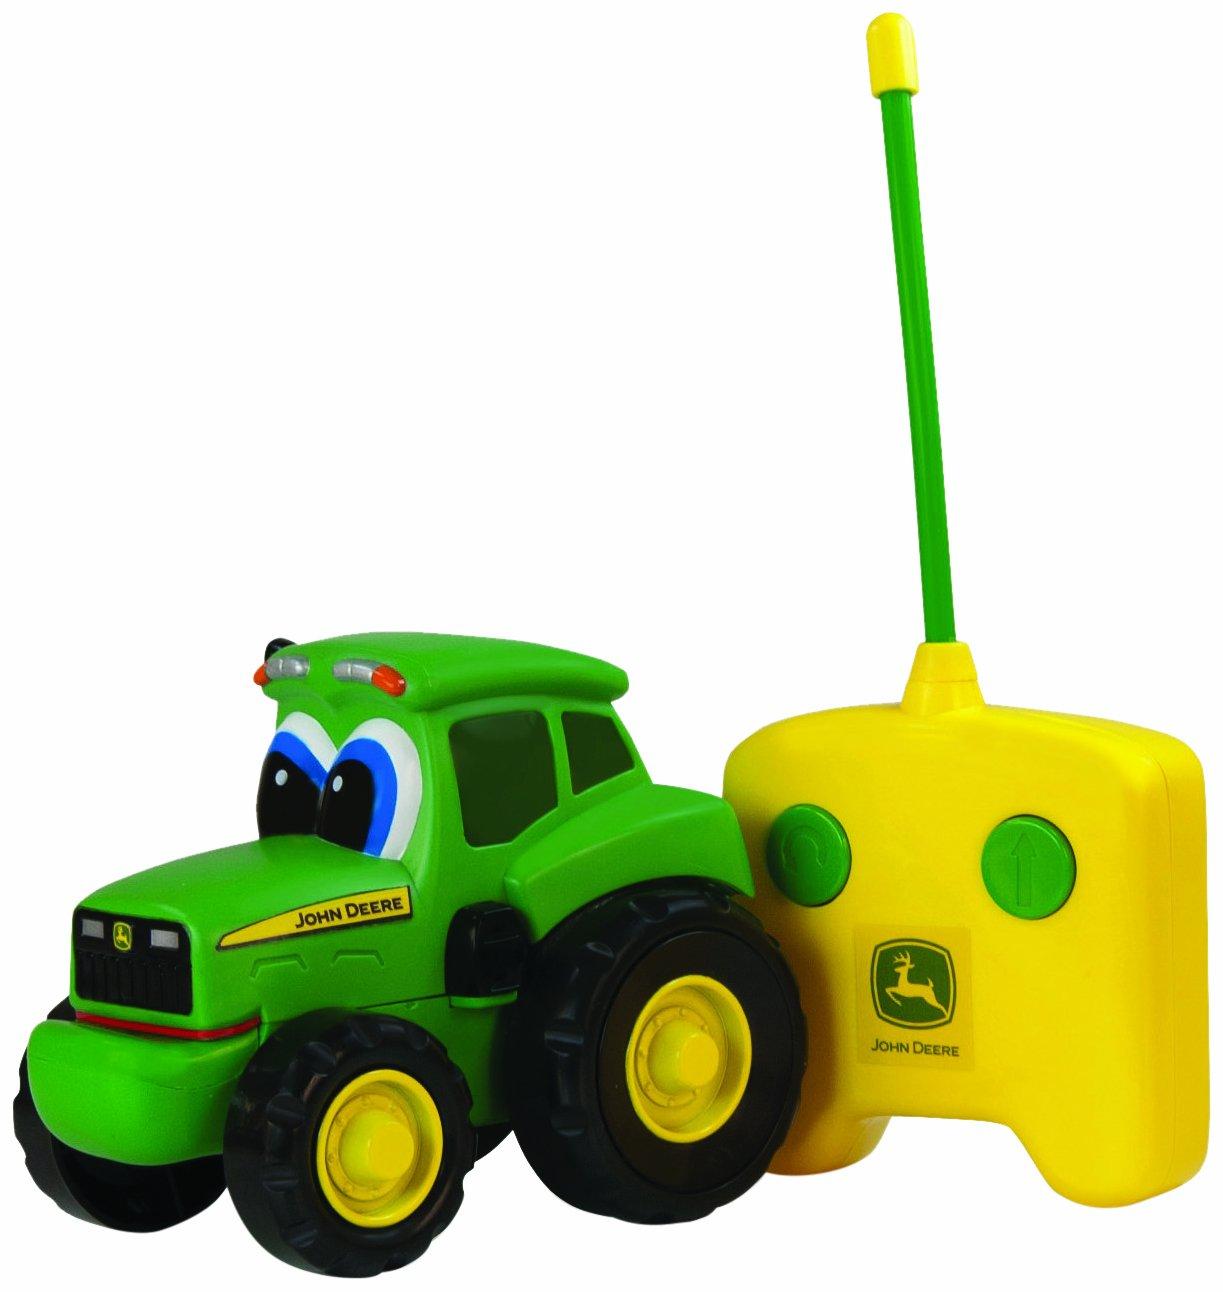 john deere 42946 r c johnny traktor echt klasse meiner meinung nach john deere spielzeug. Black Bedroom Furniture Sets. Home Design Ideas